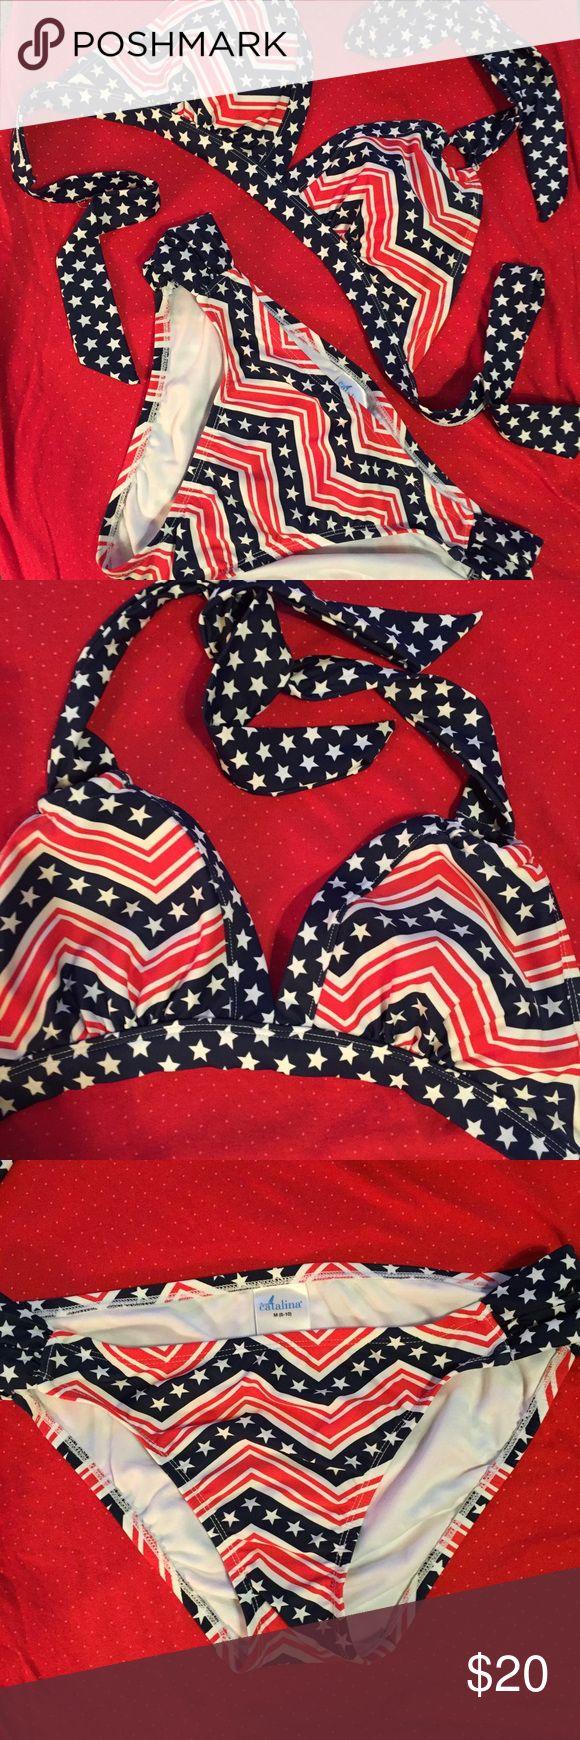 🇱🇷🇱🇷Stars and Stripes Bikini🇱🇷🇱🇷 2 piece Stars and Stripes bikini. Top has padding that can be removed. From non smoking home. Catalina Swim Bikinis